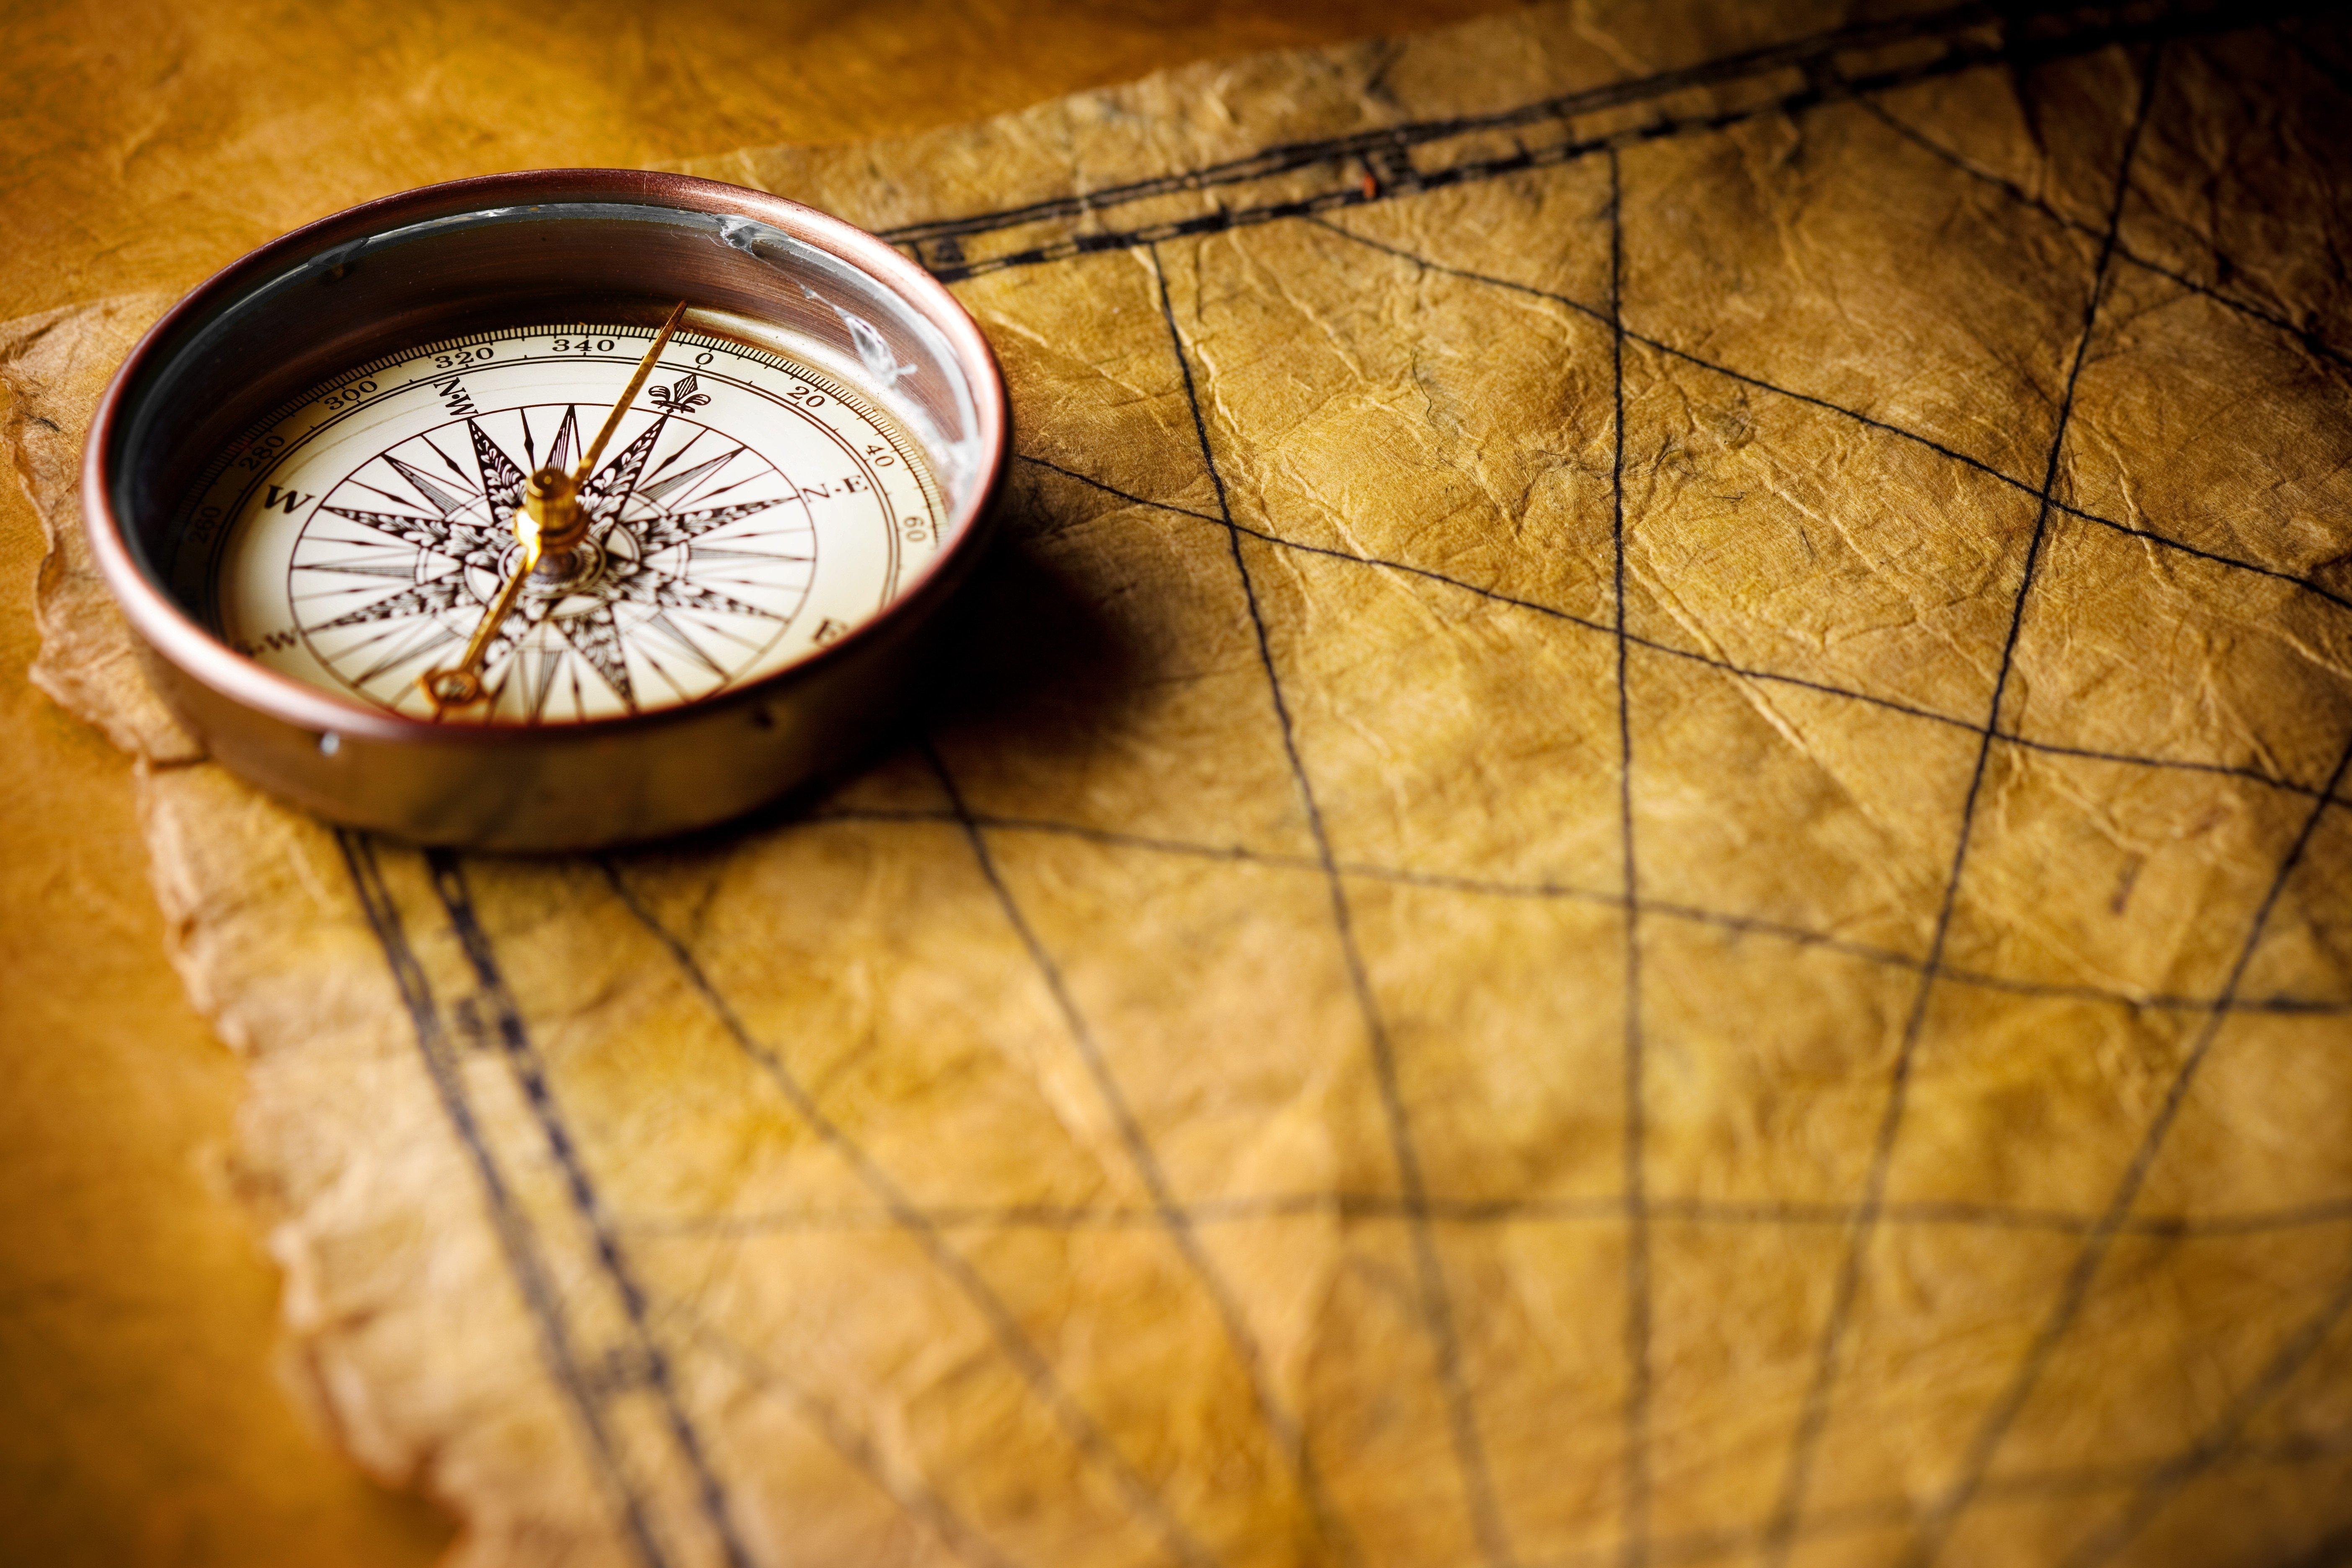 Wallpaper 5616x3744 px arrow compass map 5616x3744 coolwallpapers 1294901 hd - Compass hd wallpaper ...